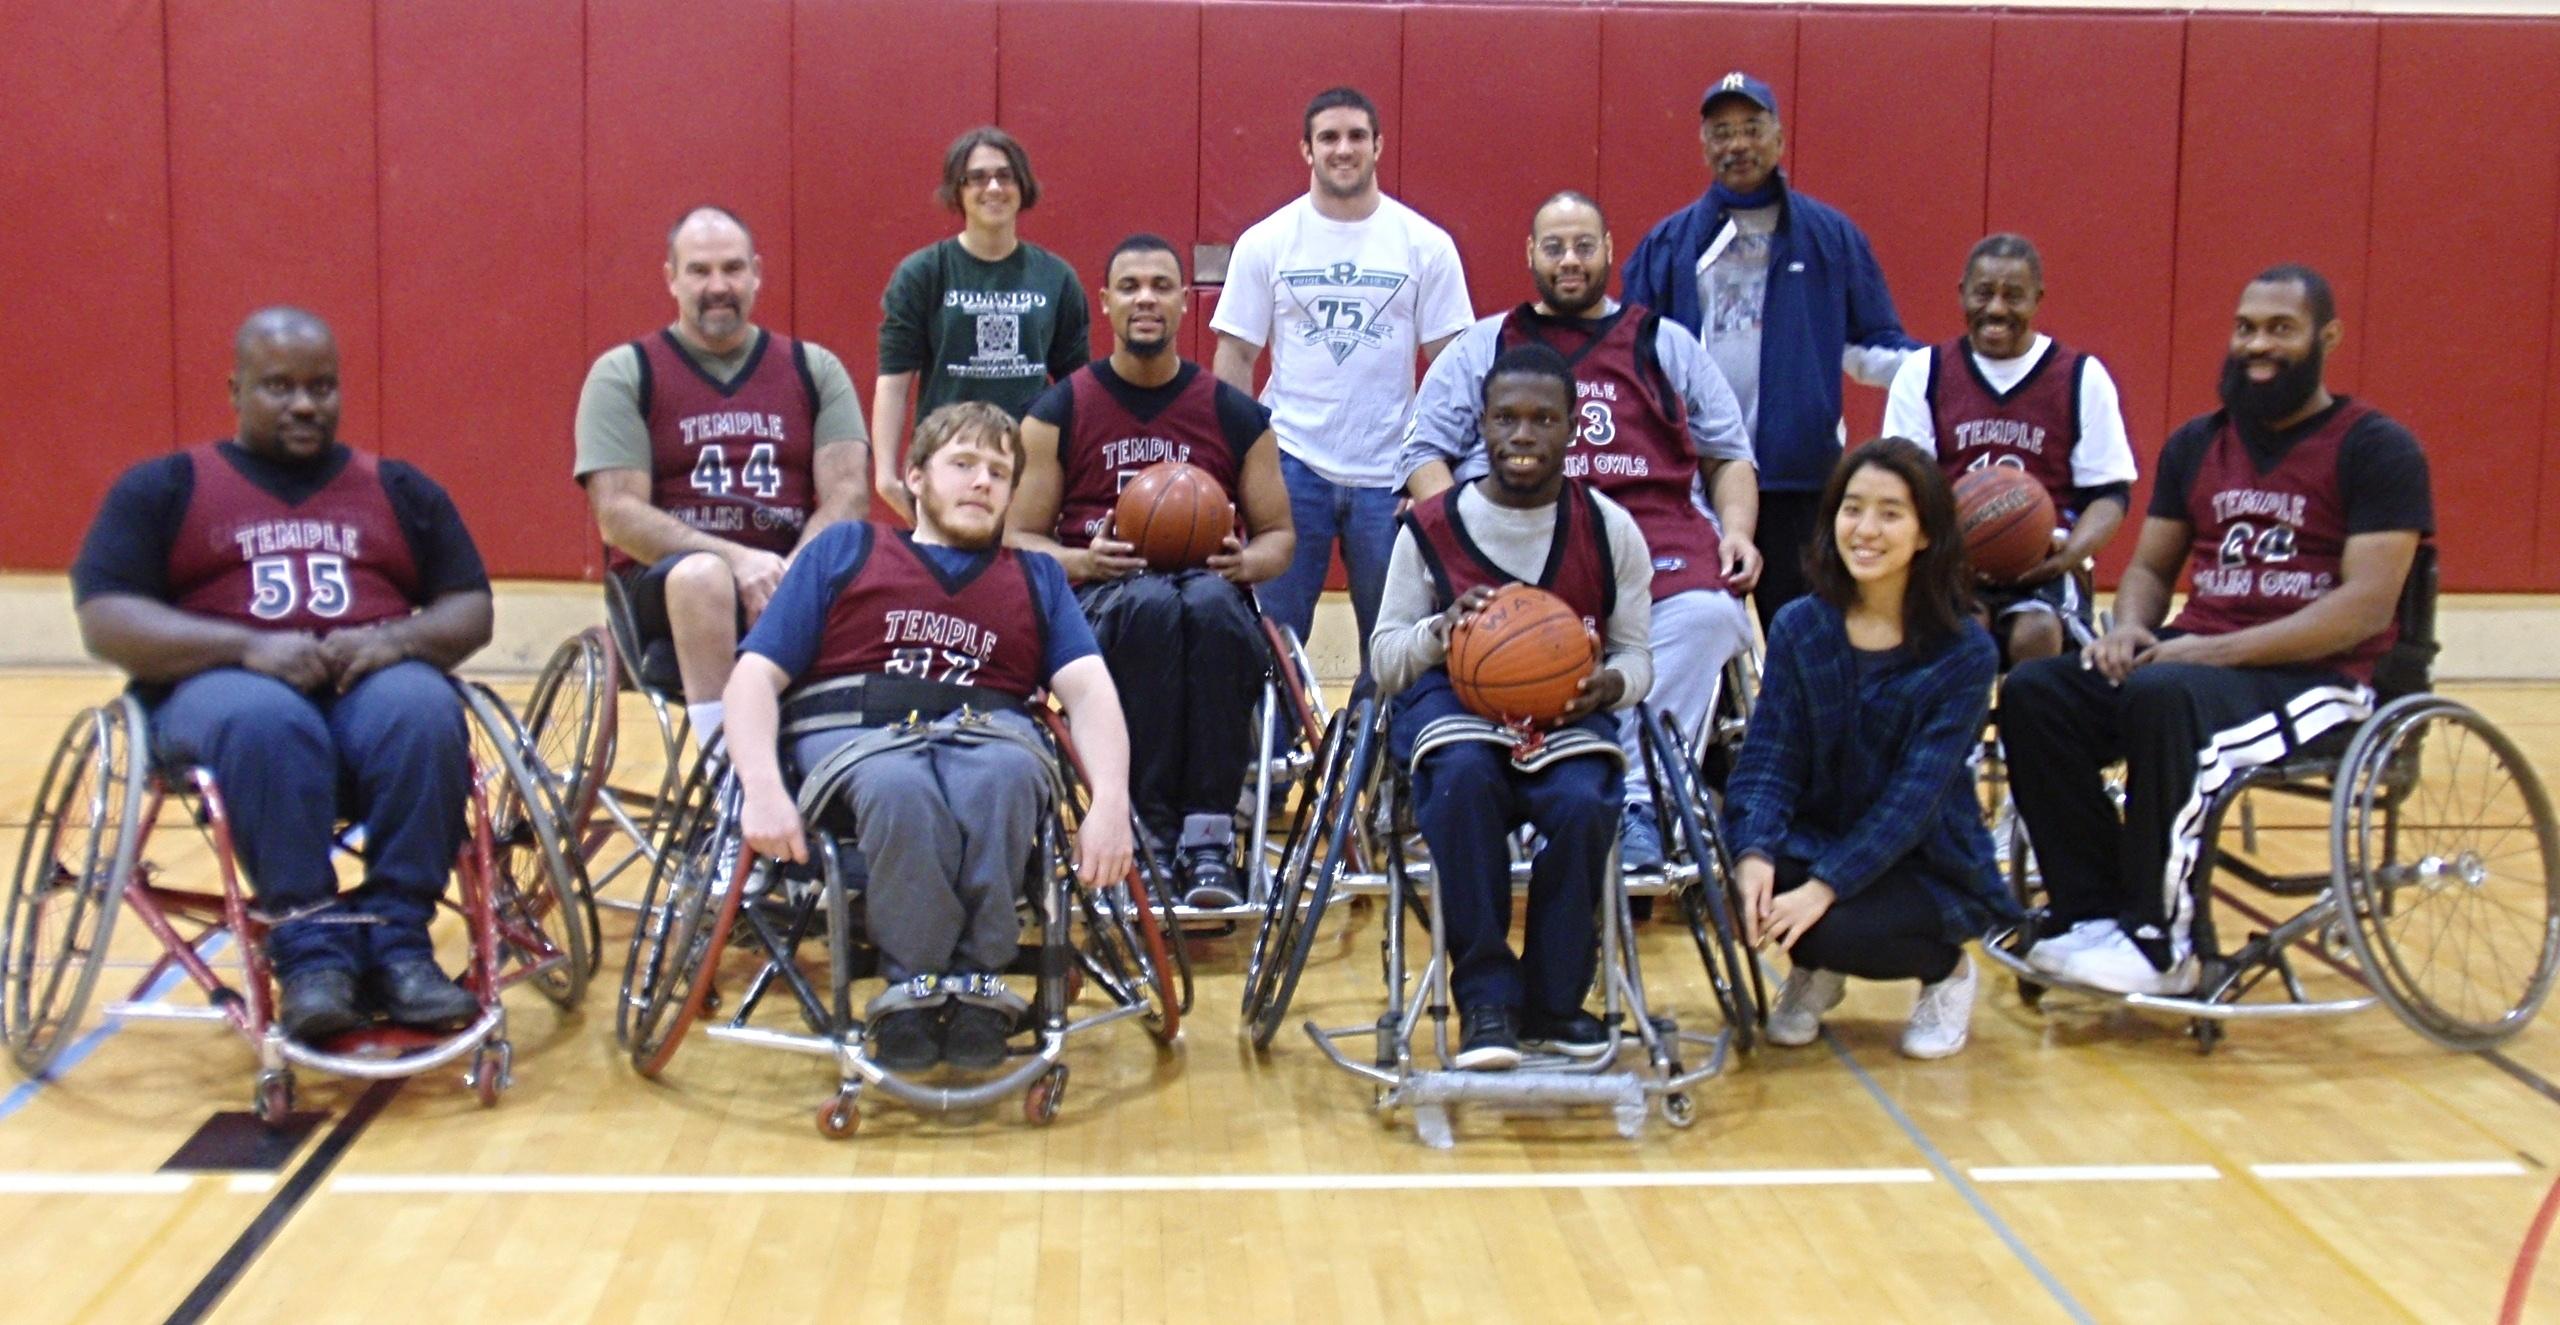 rollin owls-temple-wheelchair-basketball-seedsofhope.jpg